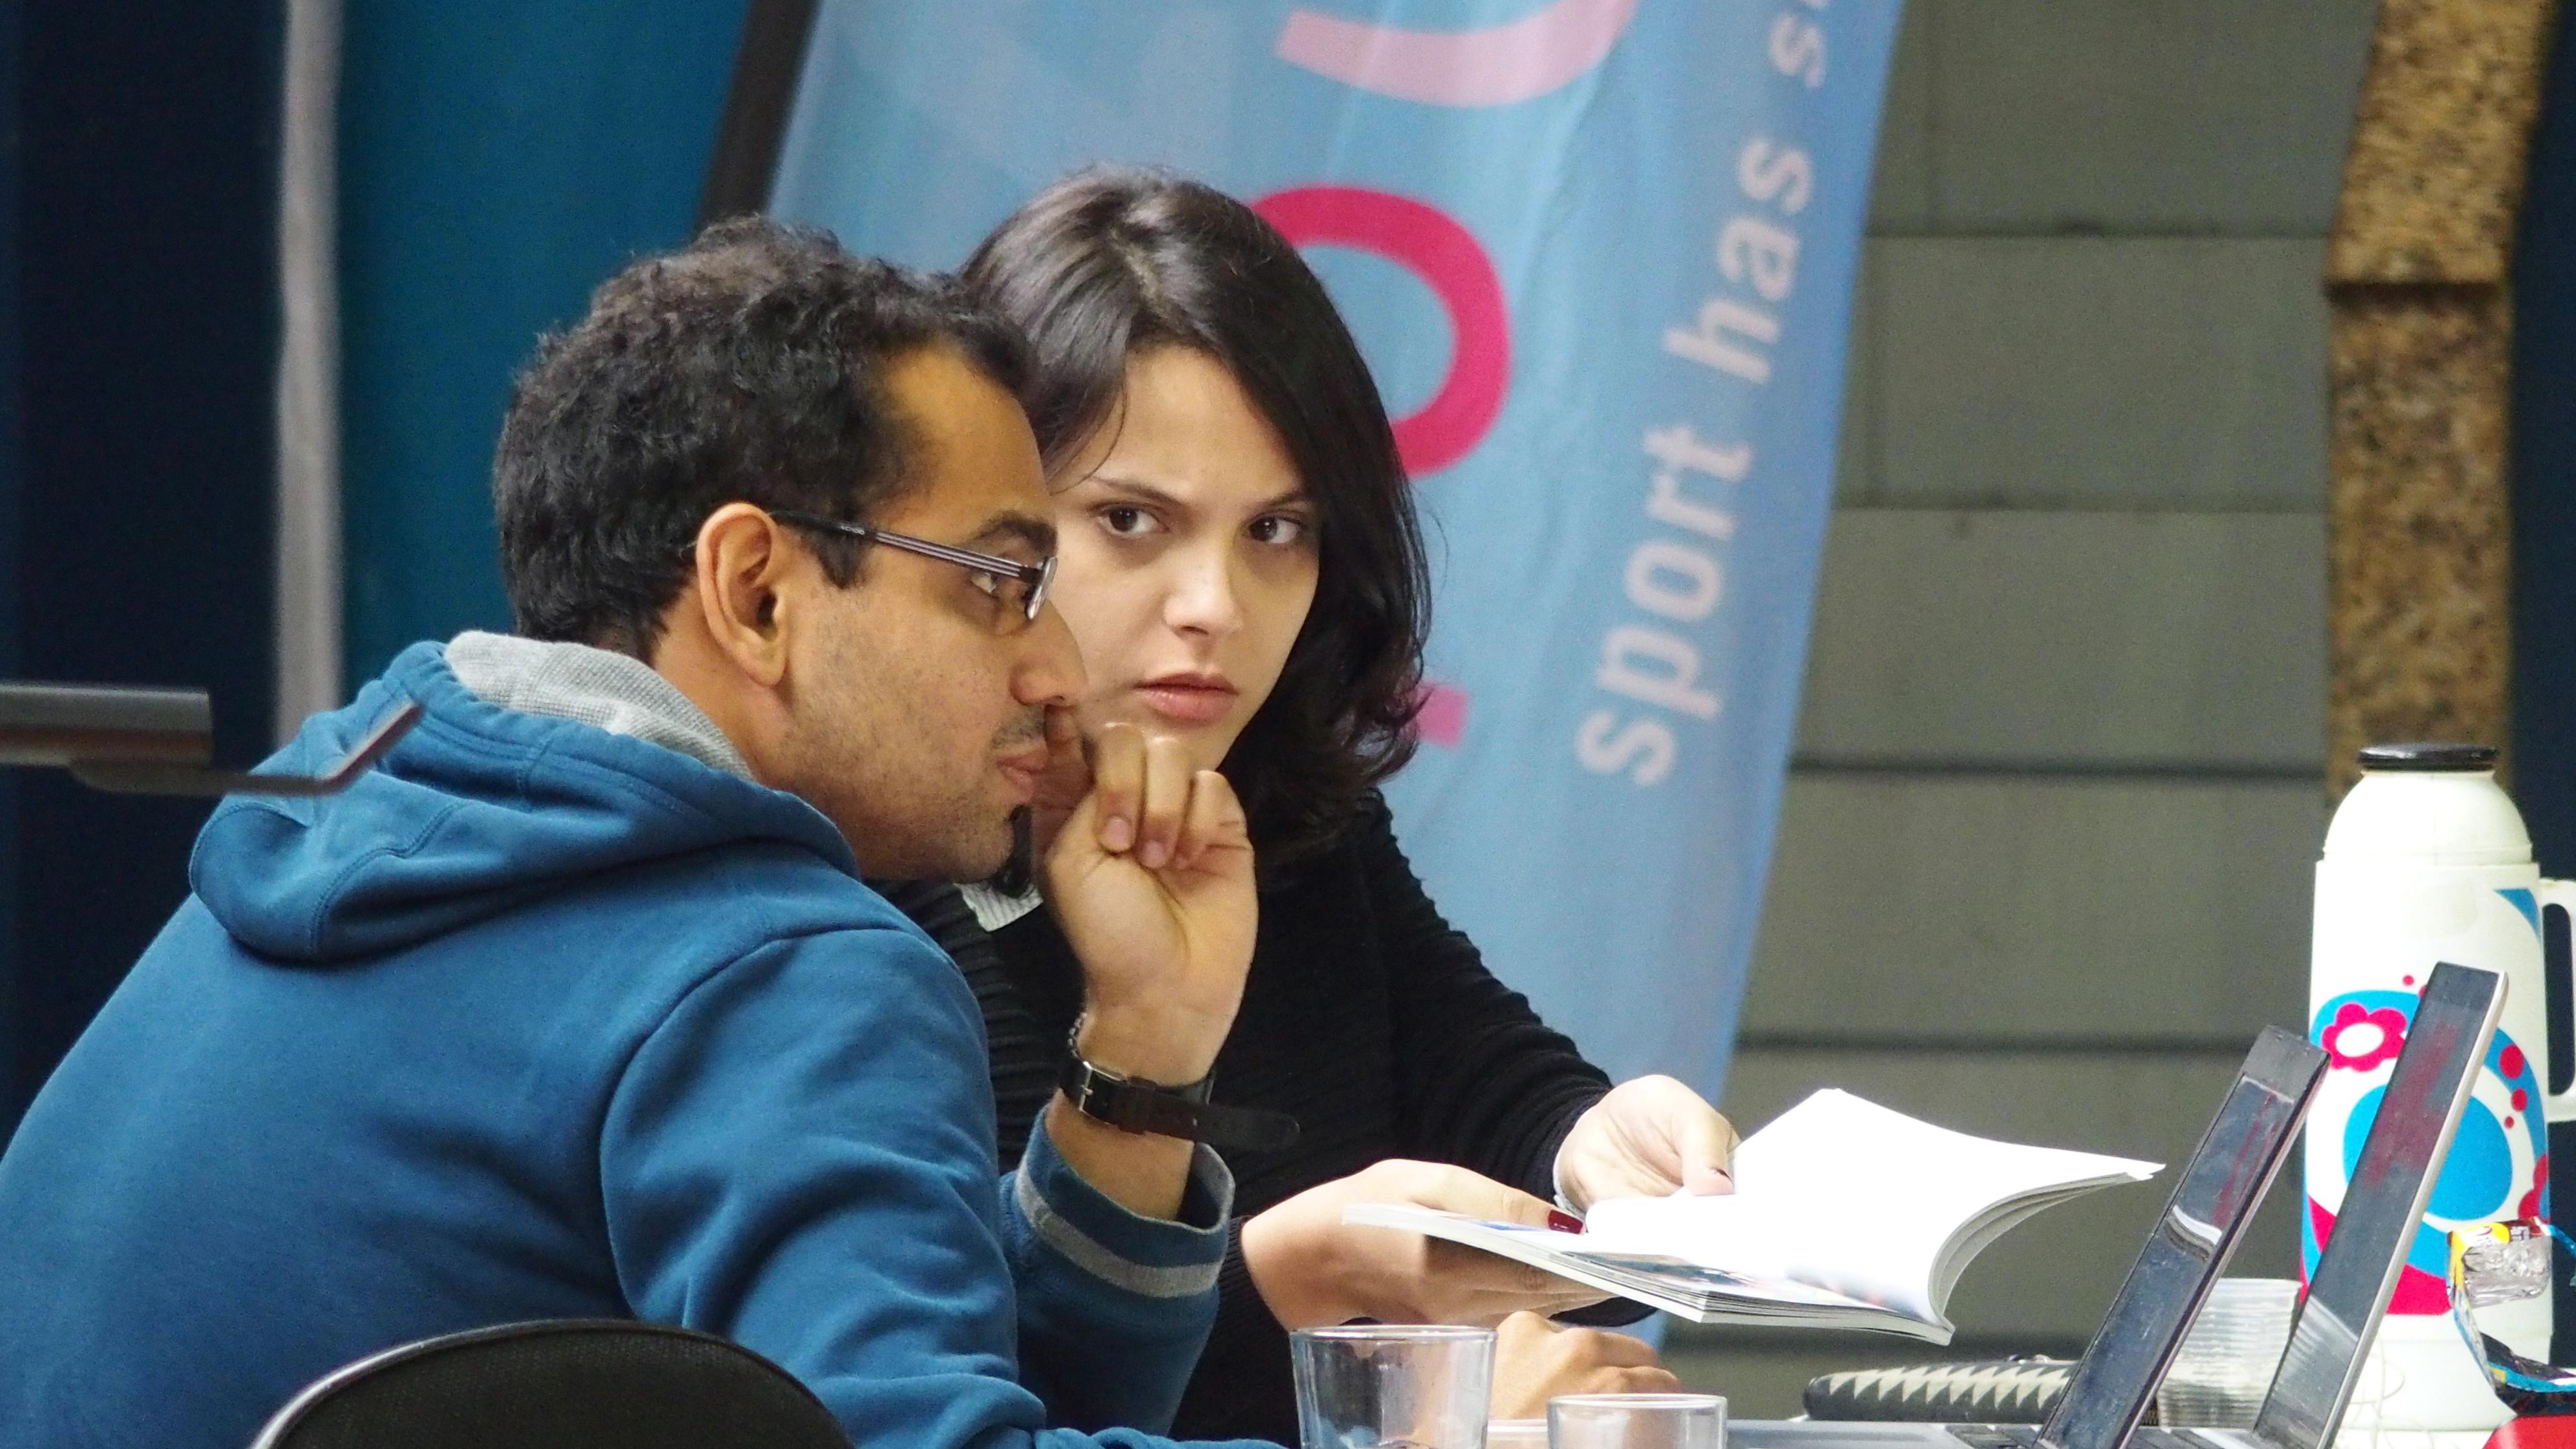 01/09/16: Partenariat Sikana – Artengo – Miratus sur Internet